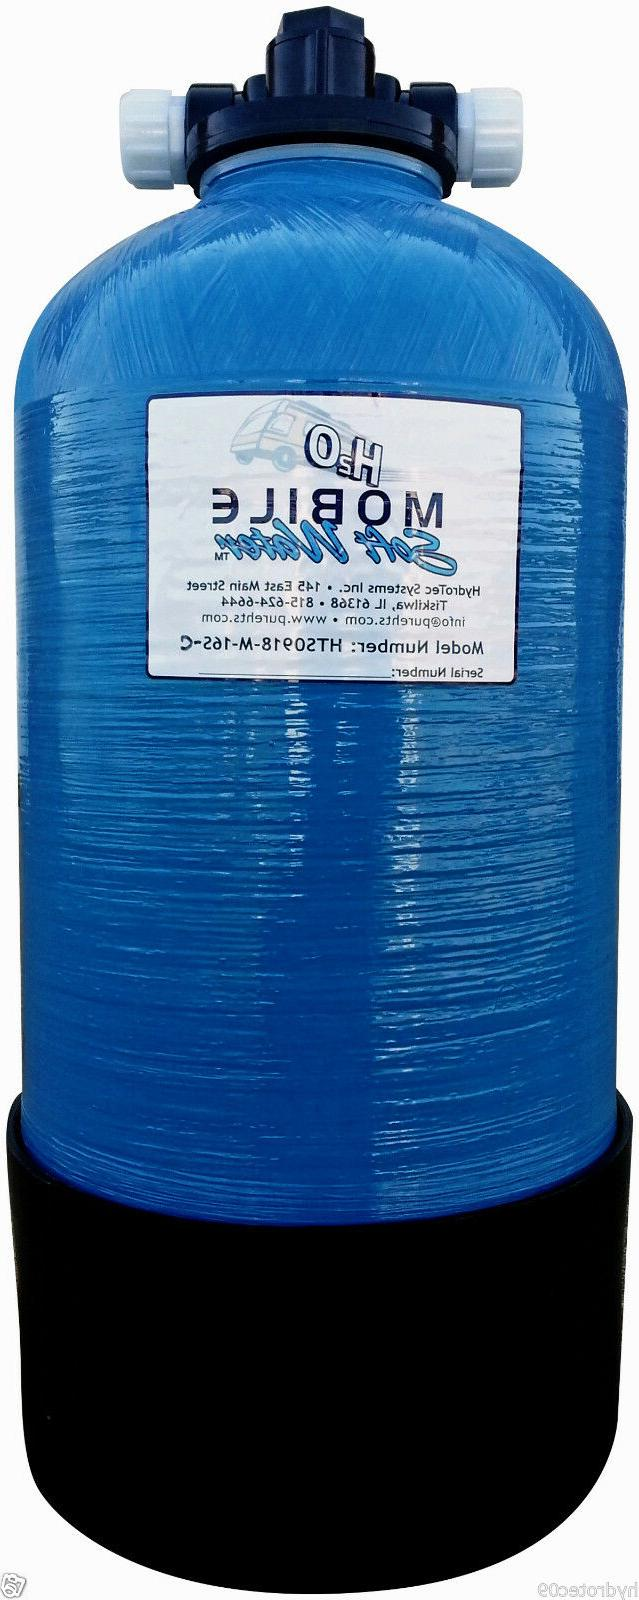 Mobile Soft Water 16000gr Portable Manual Softener,W/salt po